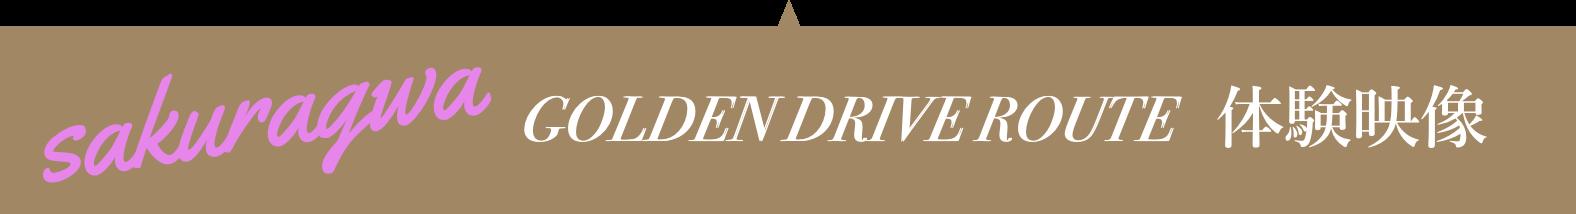 GOLDEN DRIVE ROUTE